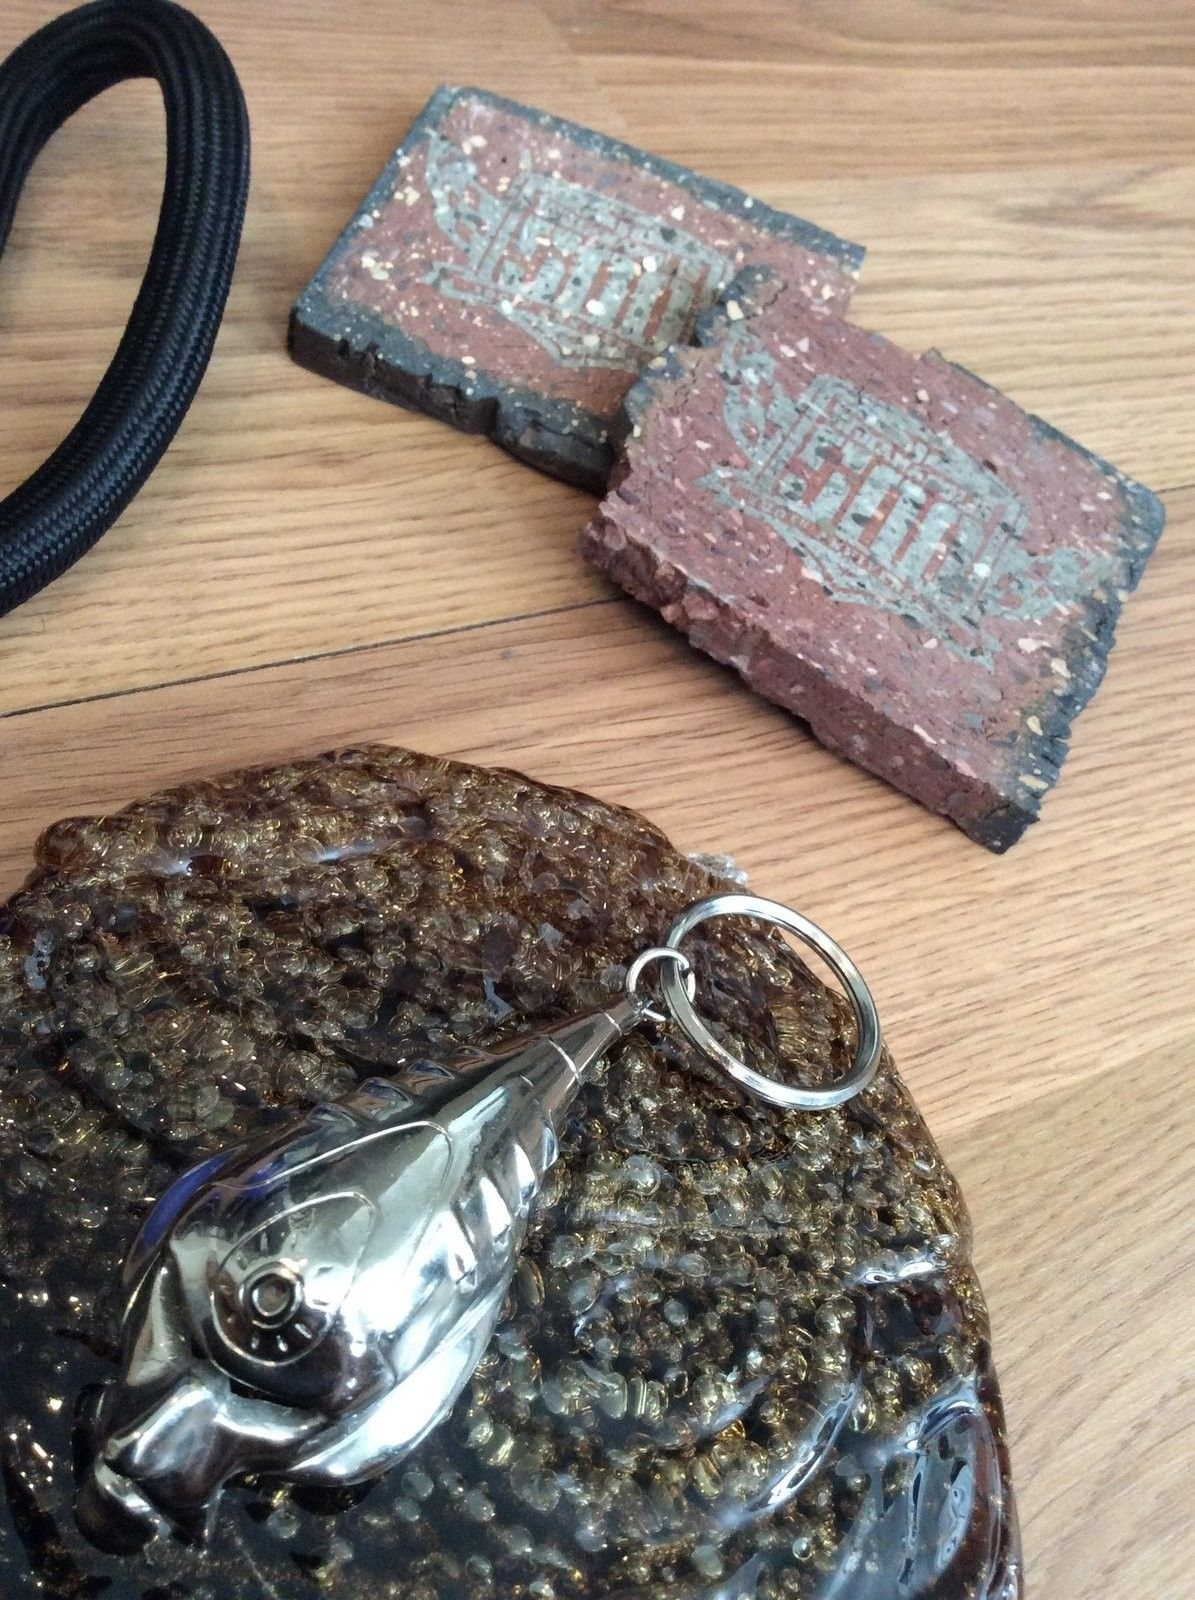 Little bob keychain $110 Shipped - image.jpg